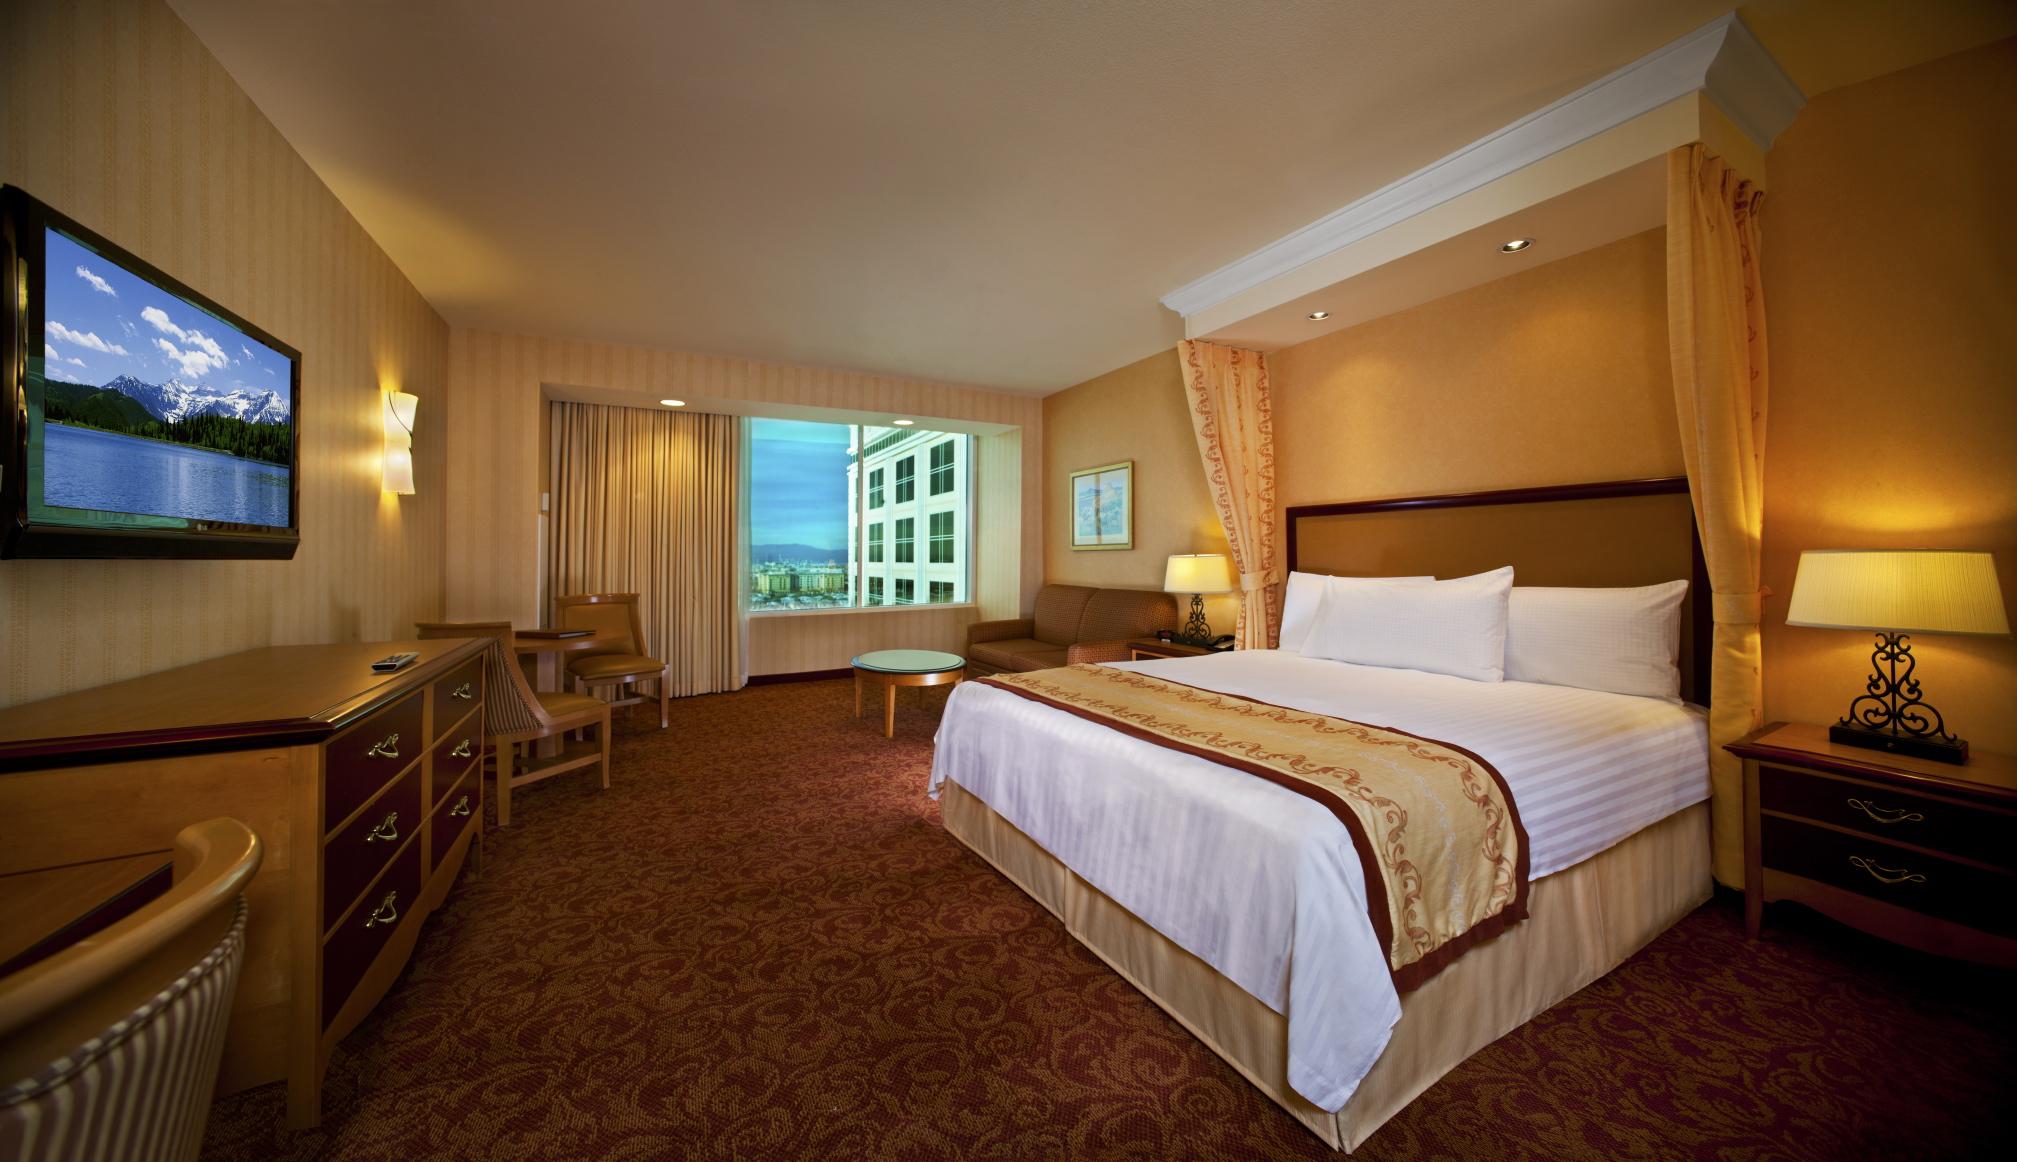 Brunswick Room At South Point Hotel Casino Spa Las Vegas Venue Eventopedia